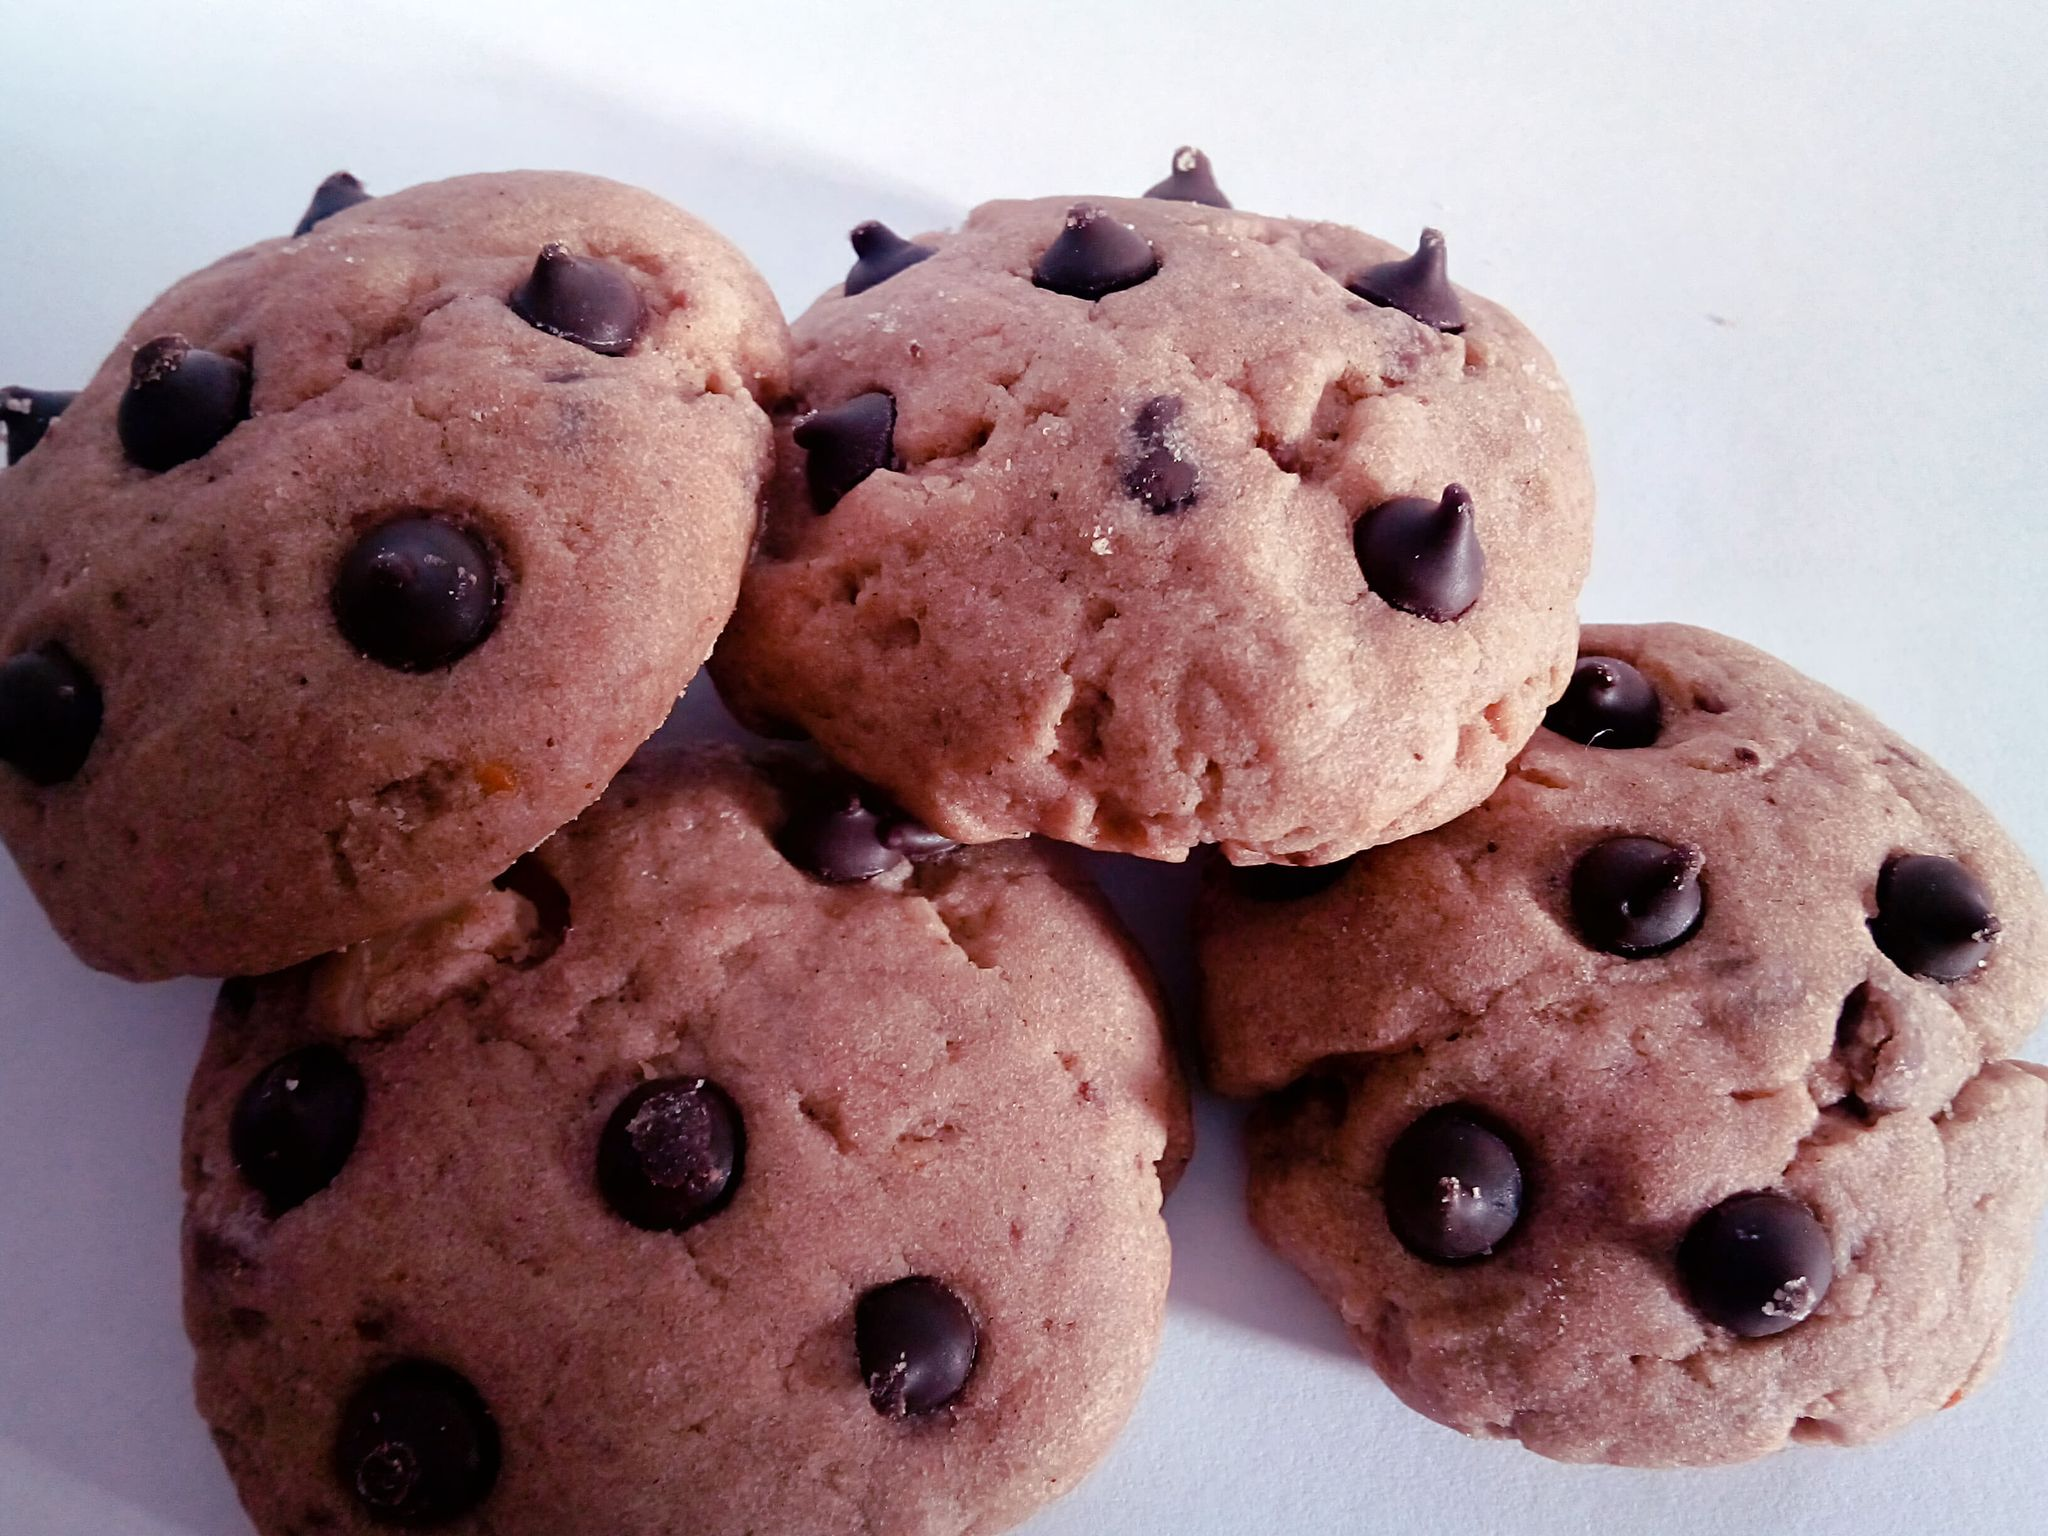 Homemade Cinnamon Chocolate Chip Cookies